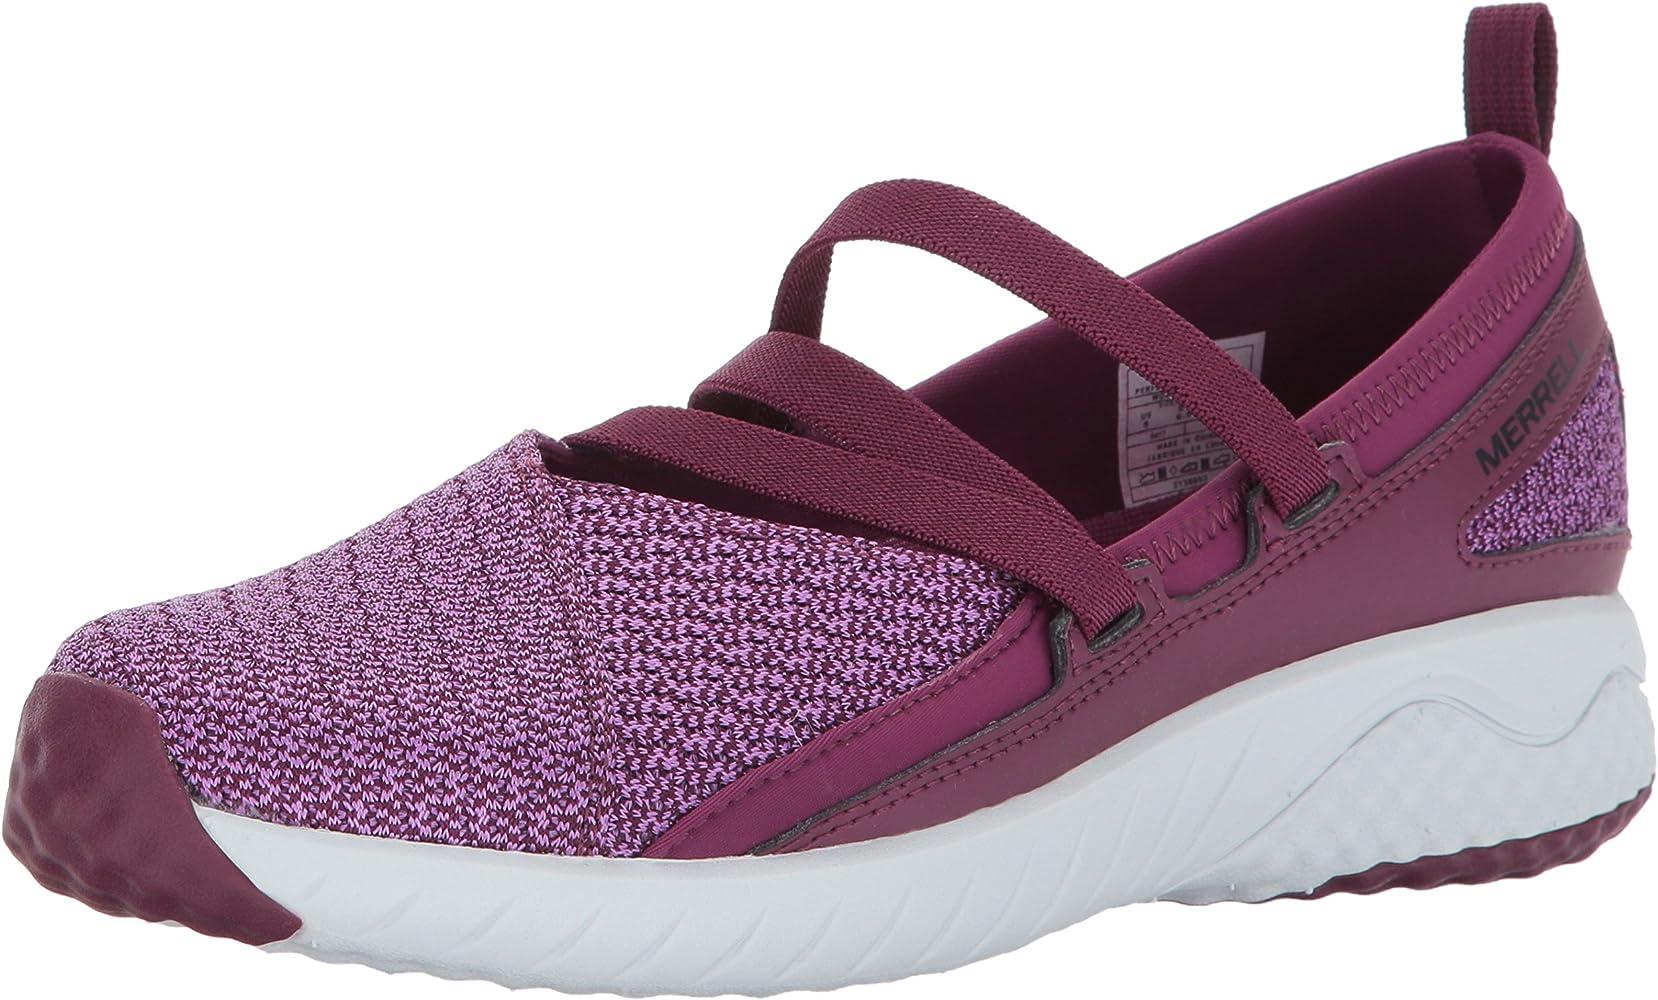 merrell mary jane shoes canada adidas